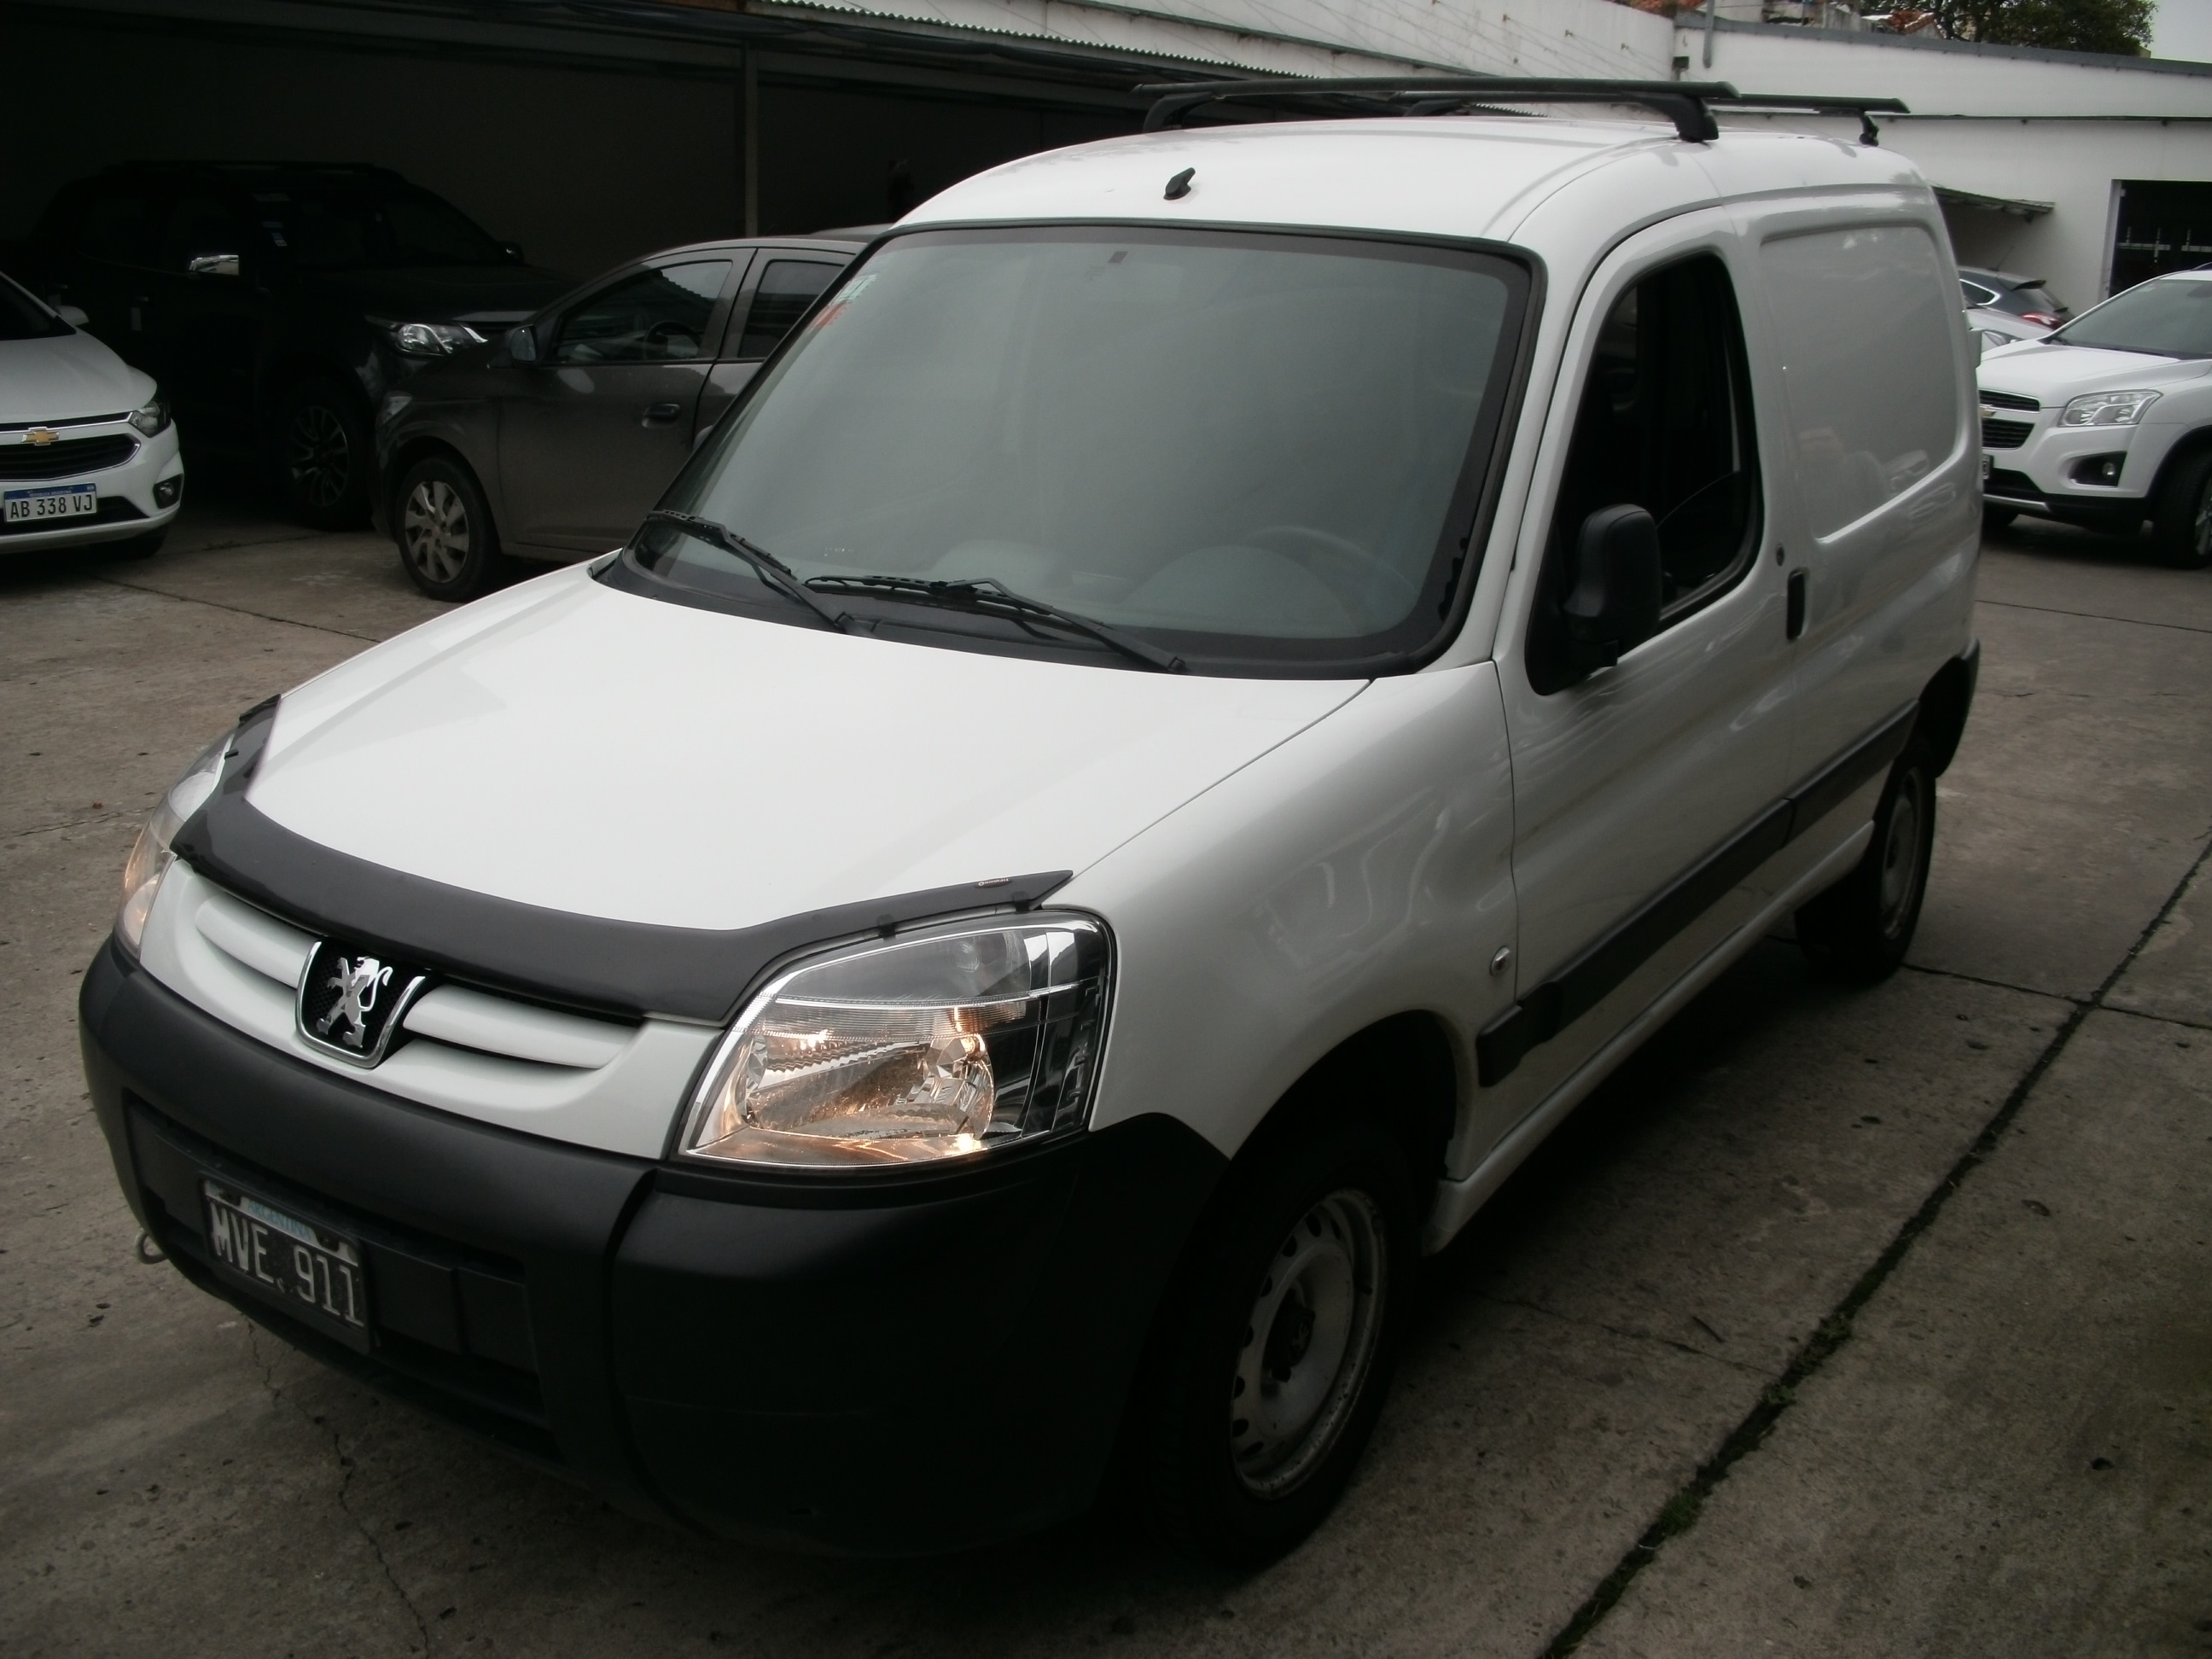 2013 Peugeot Partner Confort 1.4